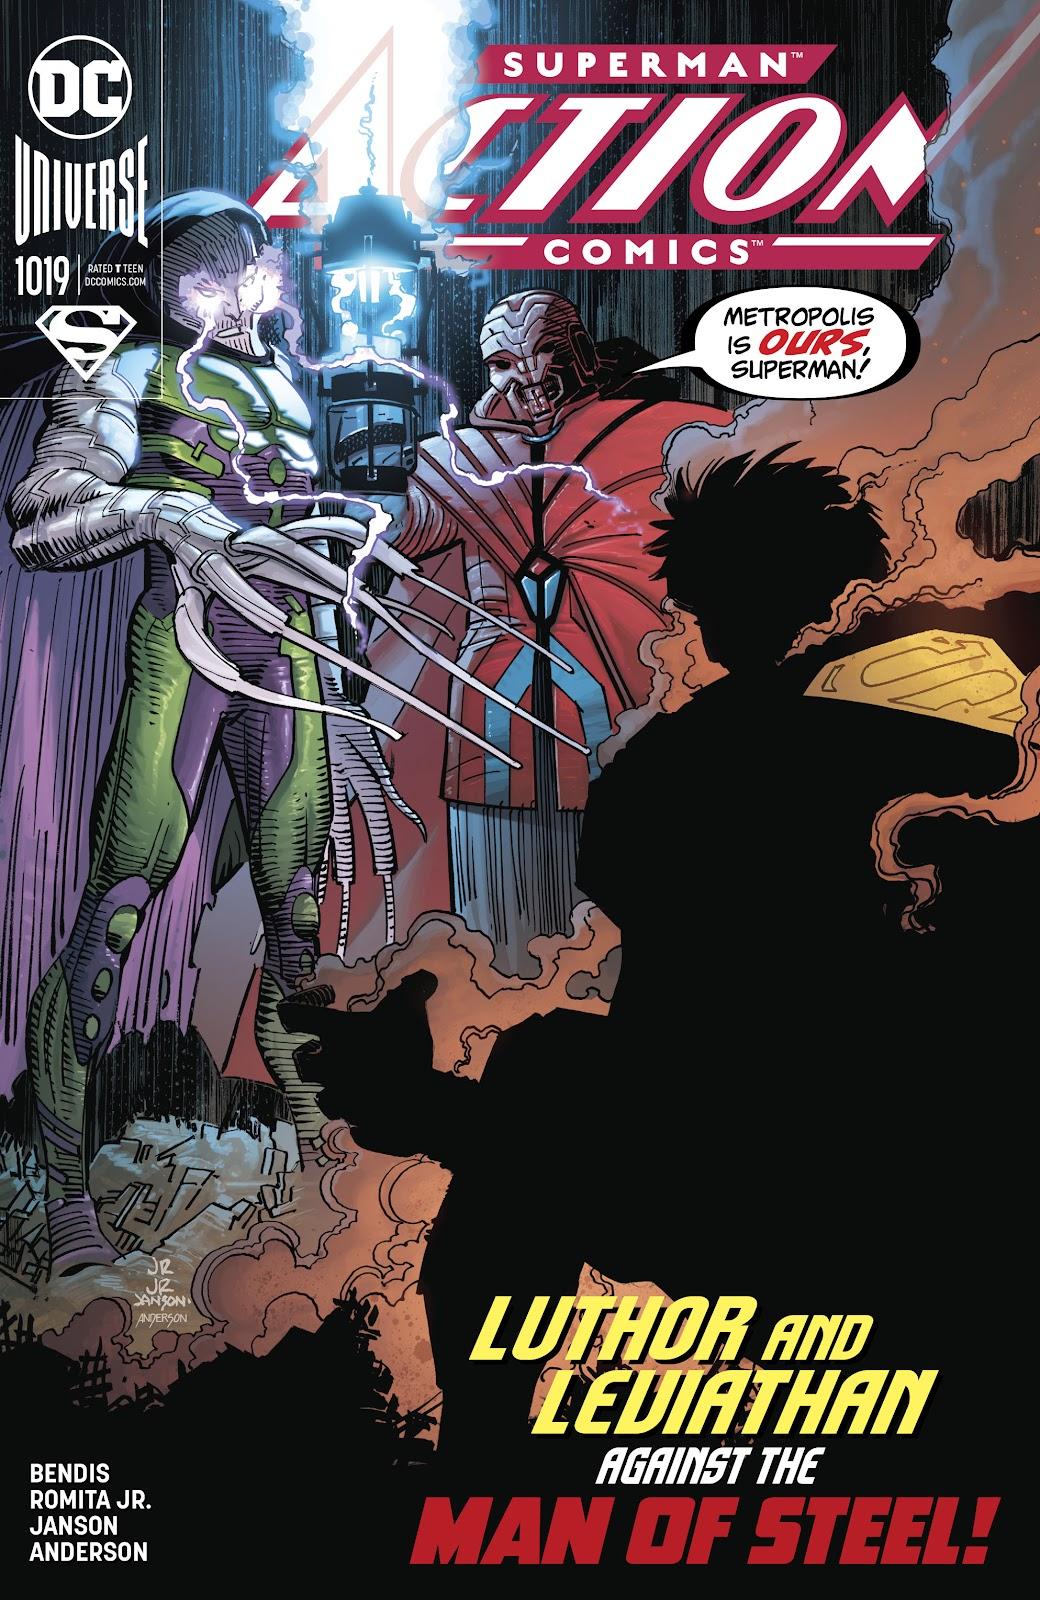 Action Comics (2016) 1019 Page 1